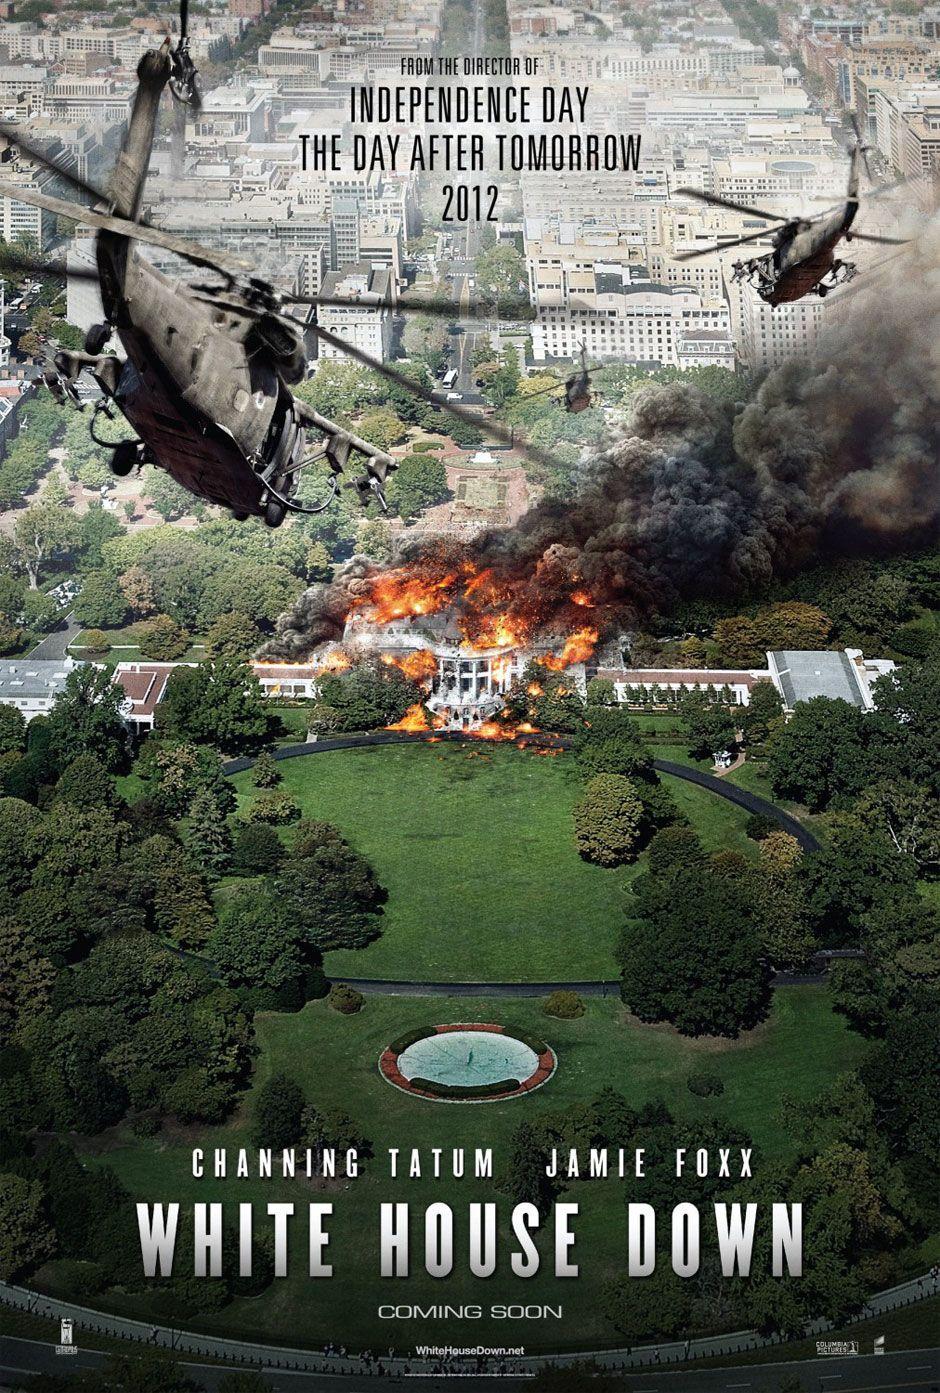 White House Down (2013) Movie Poster